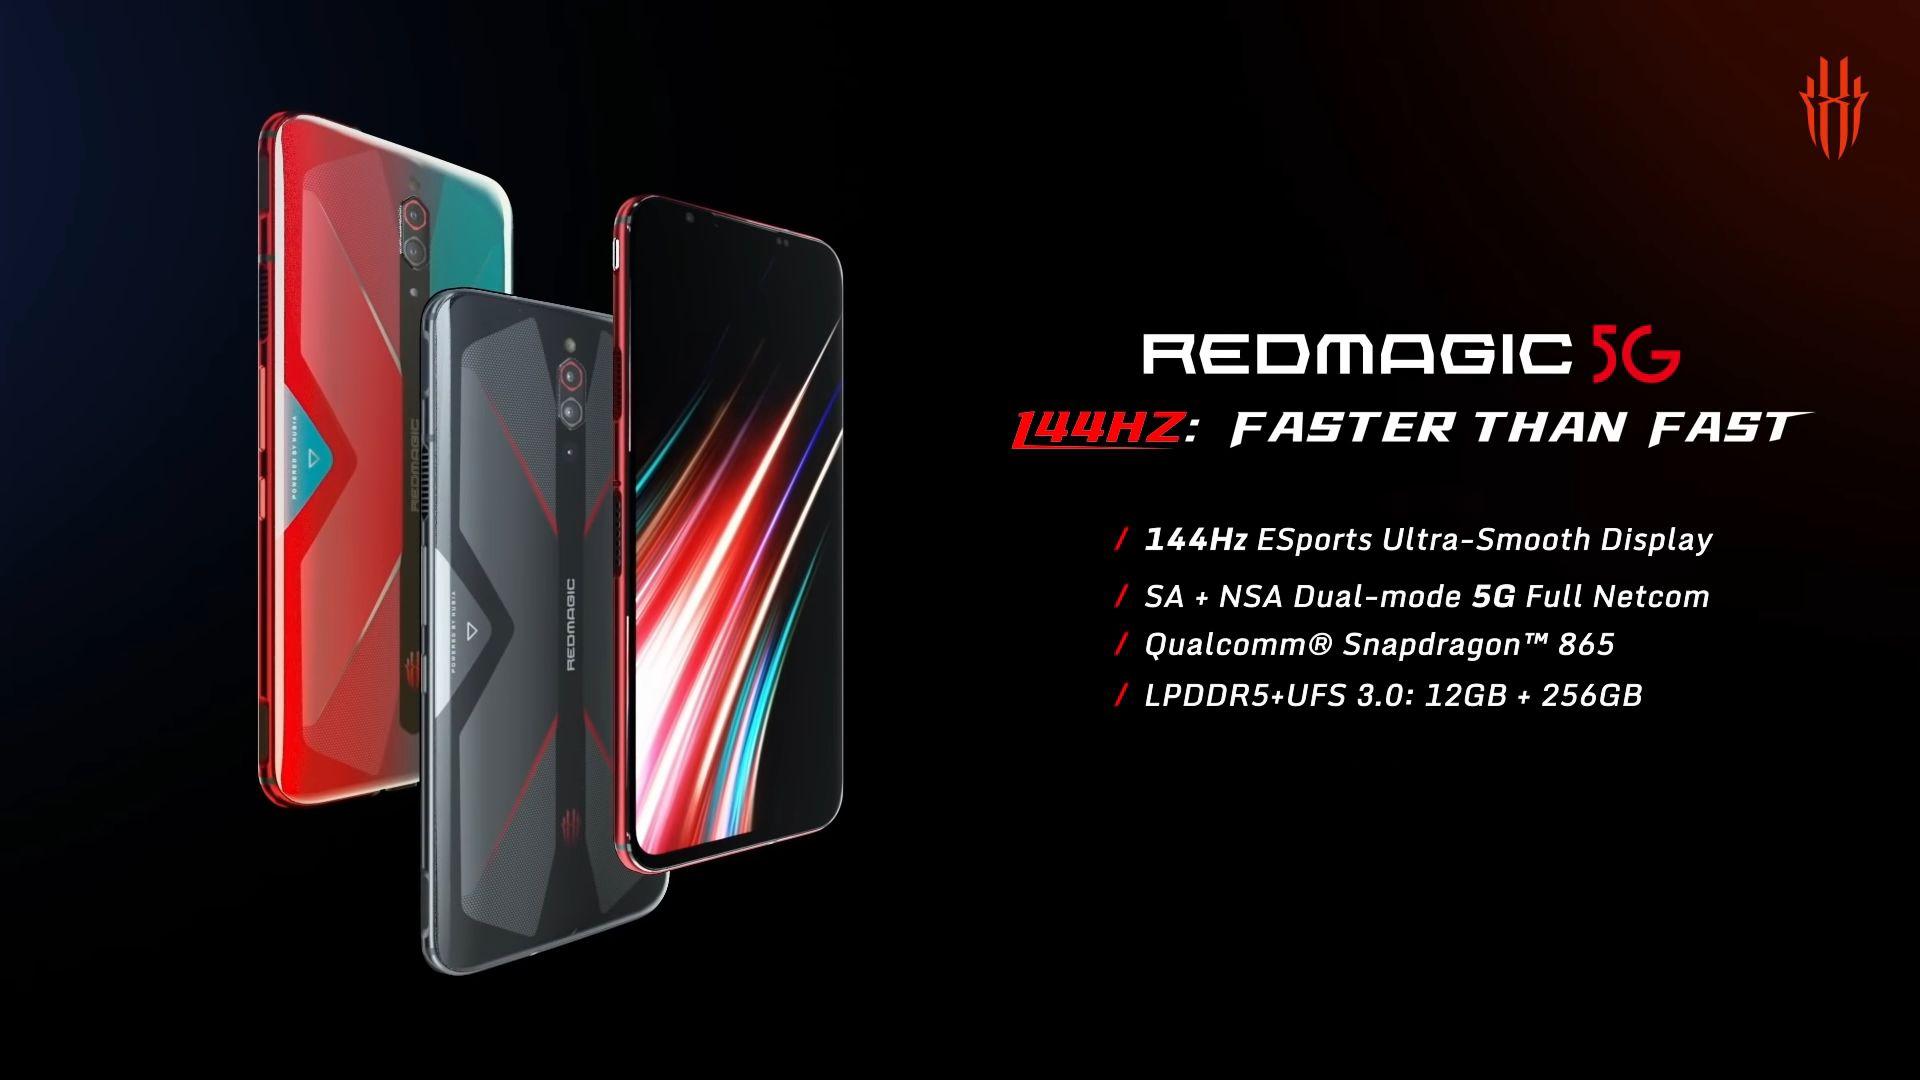 RedMagic 5G disponibile in preordine: Snapdragon 865, 5G, display a 144Hz...